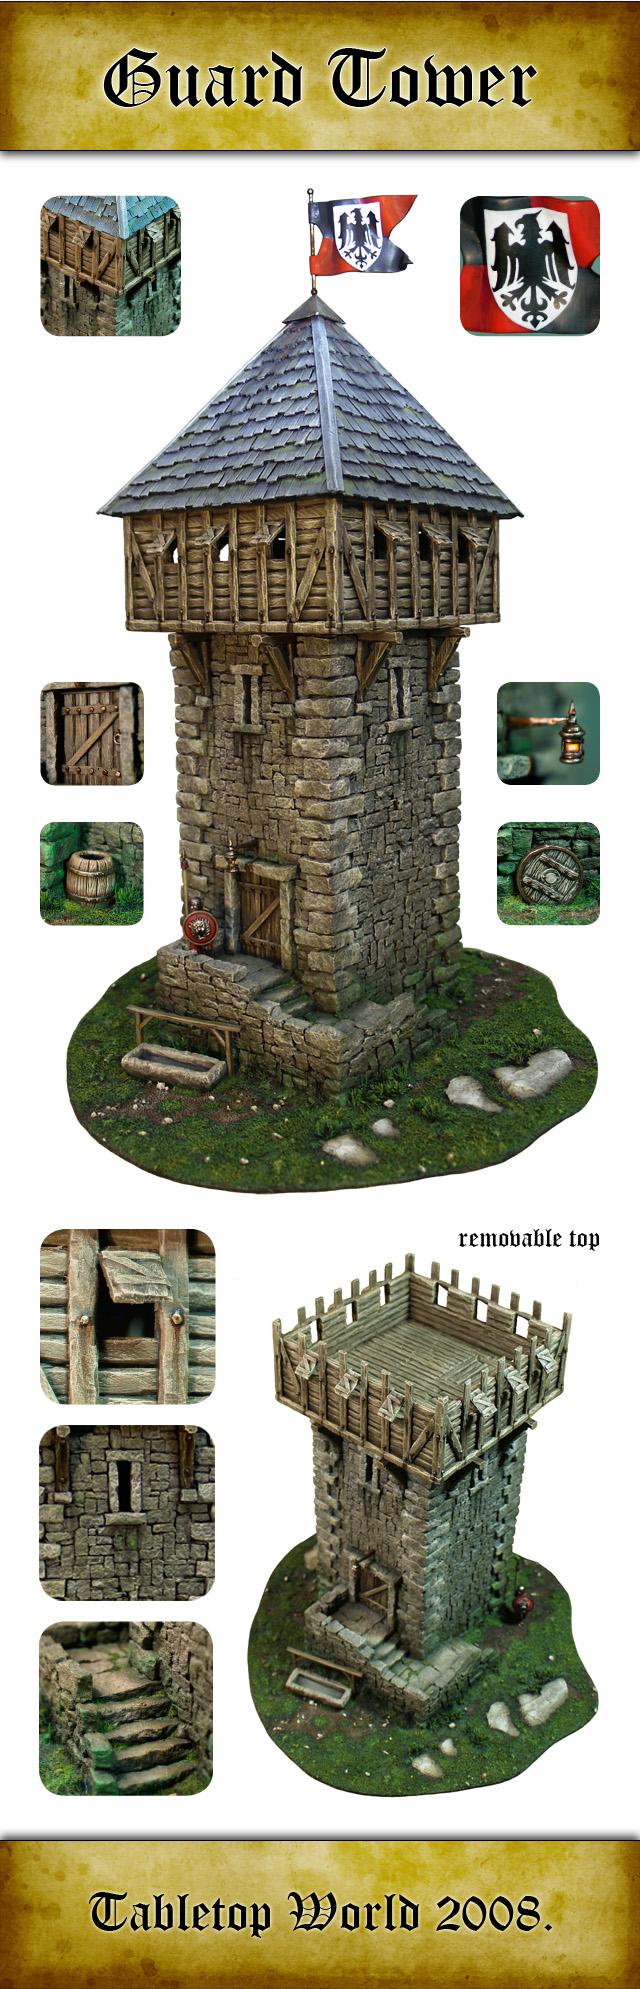 Tabletop Scenery GuardTower